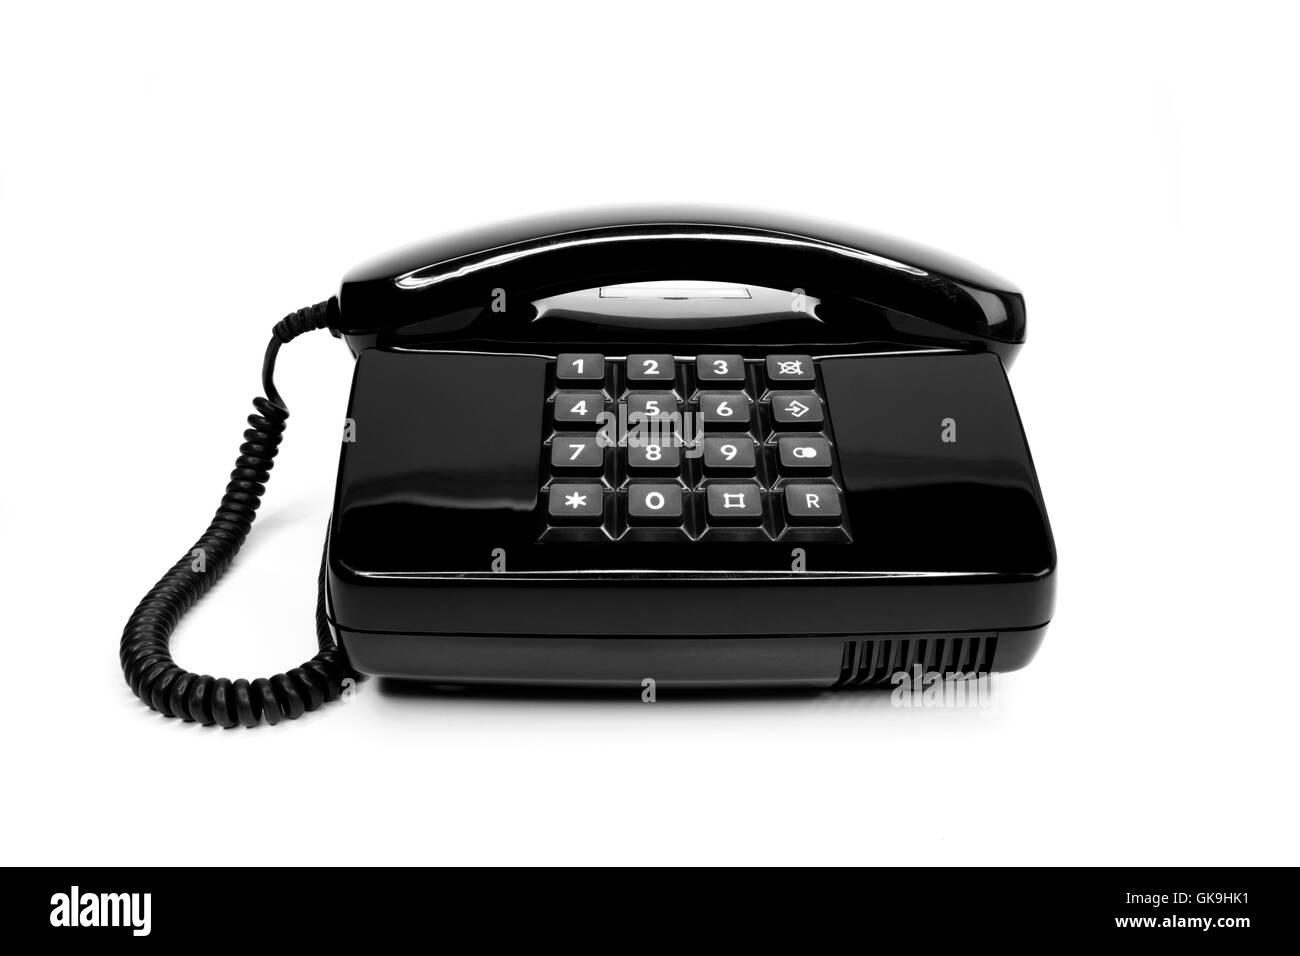 classic black telephone from the eighties Stock Photo